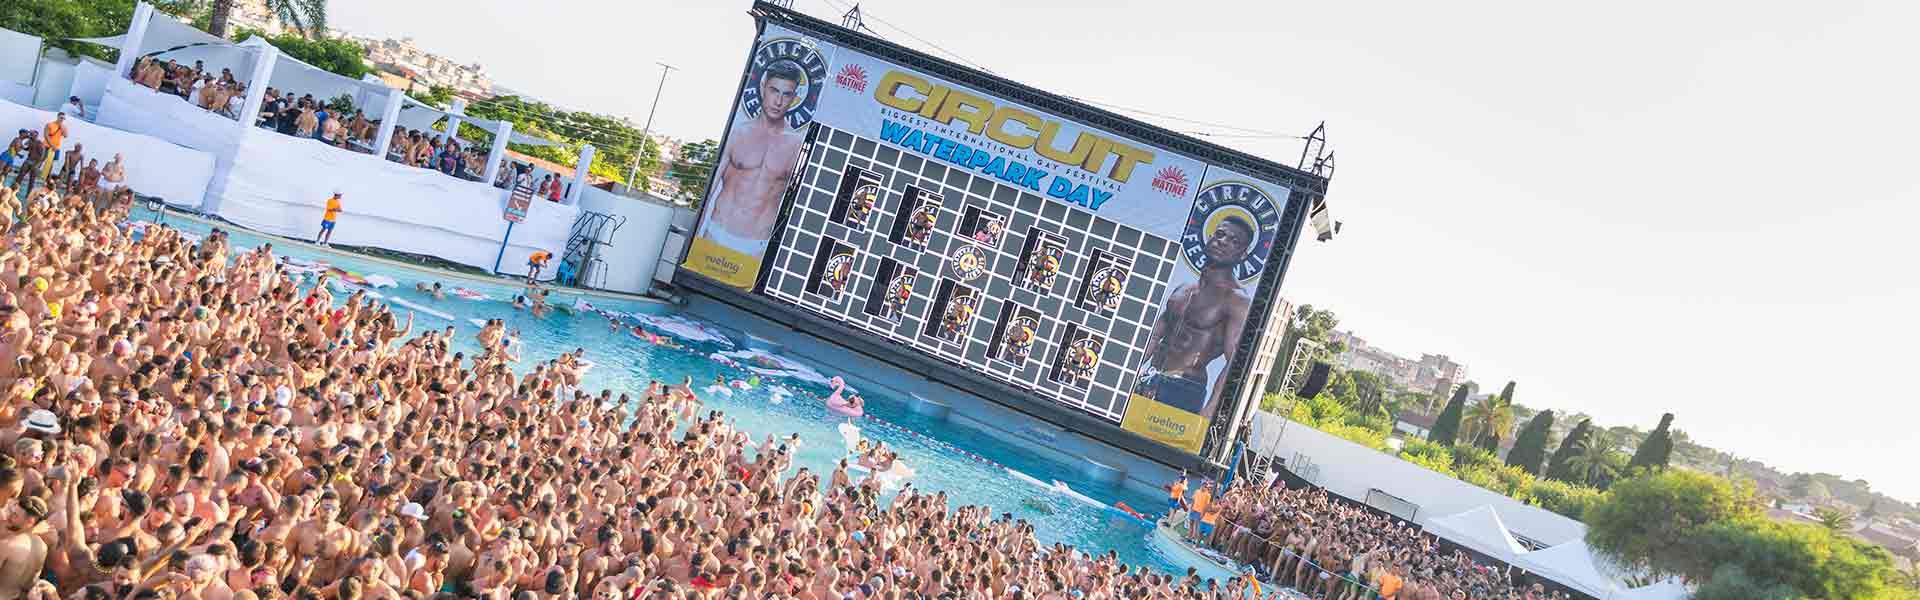 fiestas gay barcelona 2020